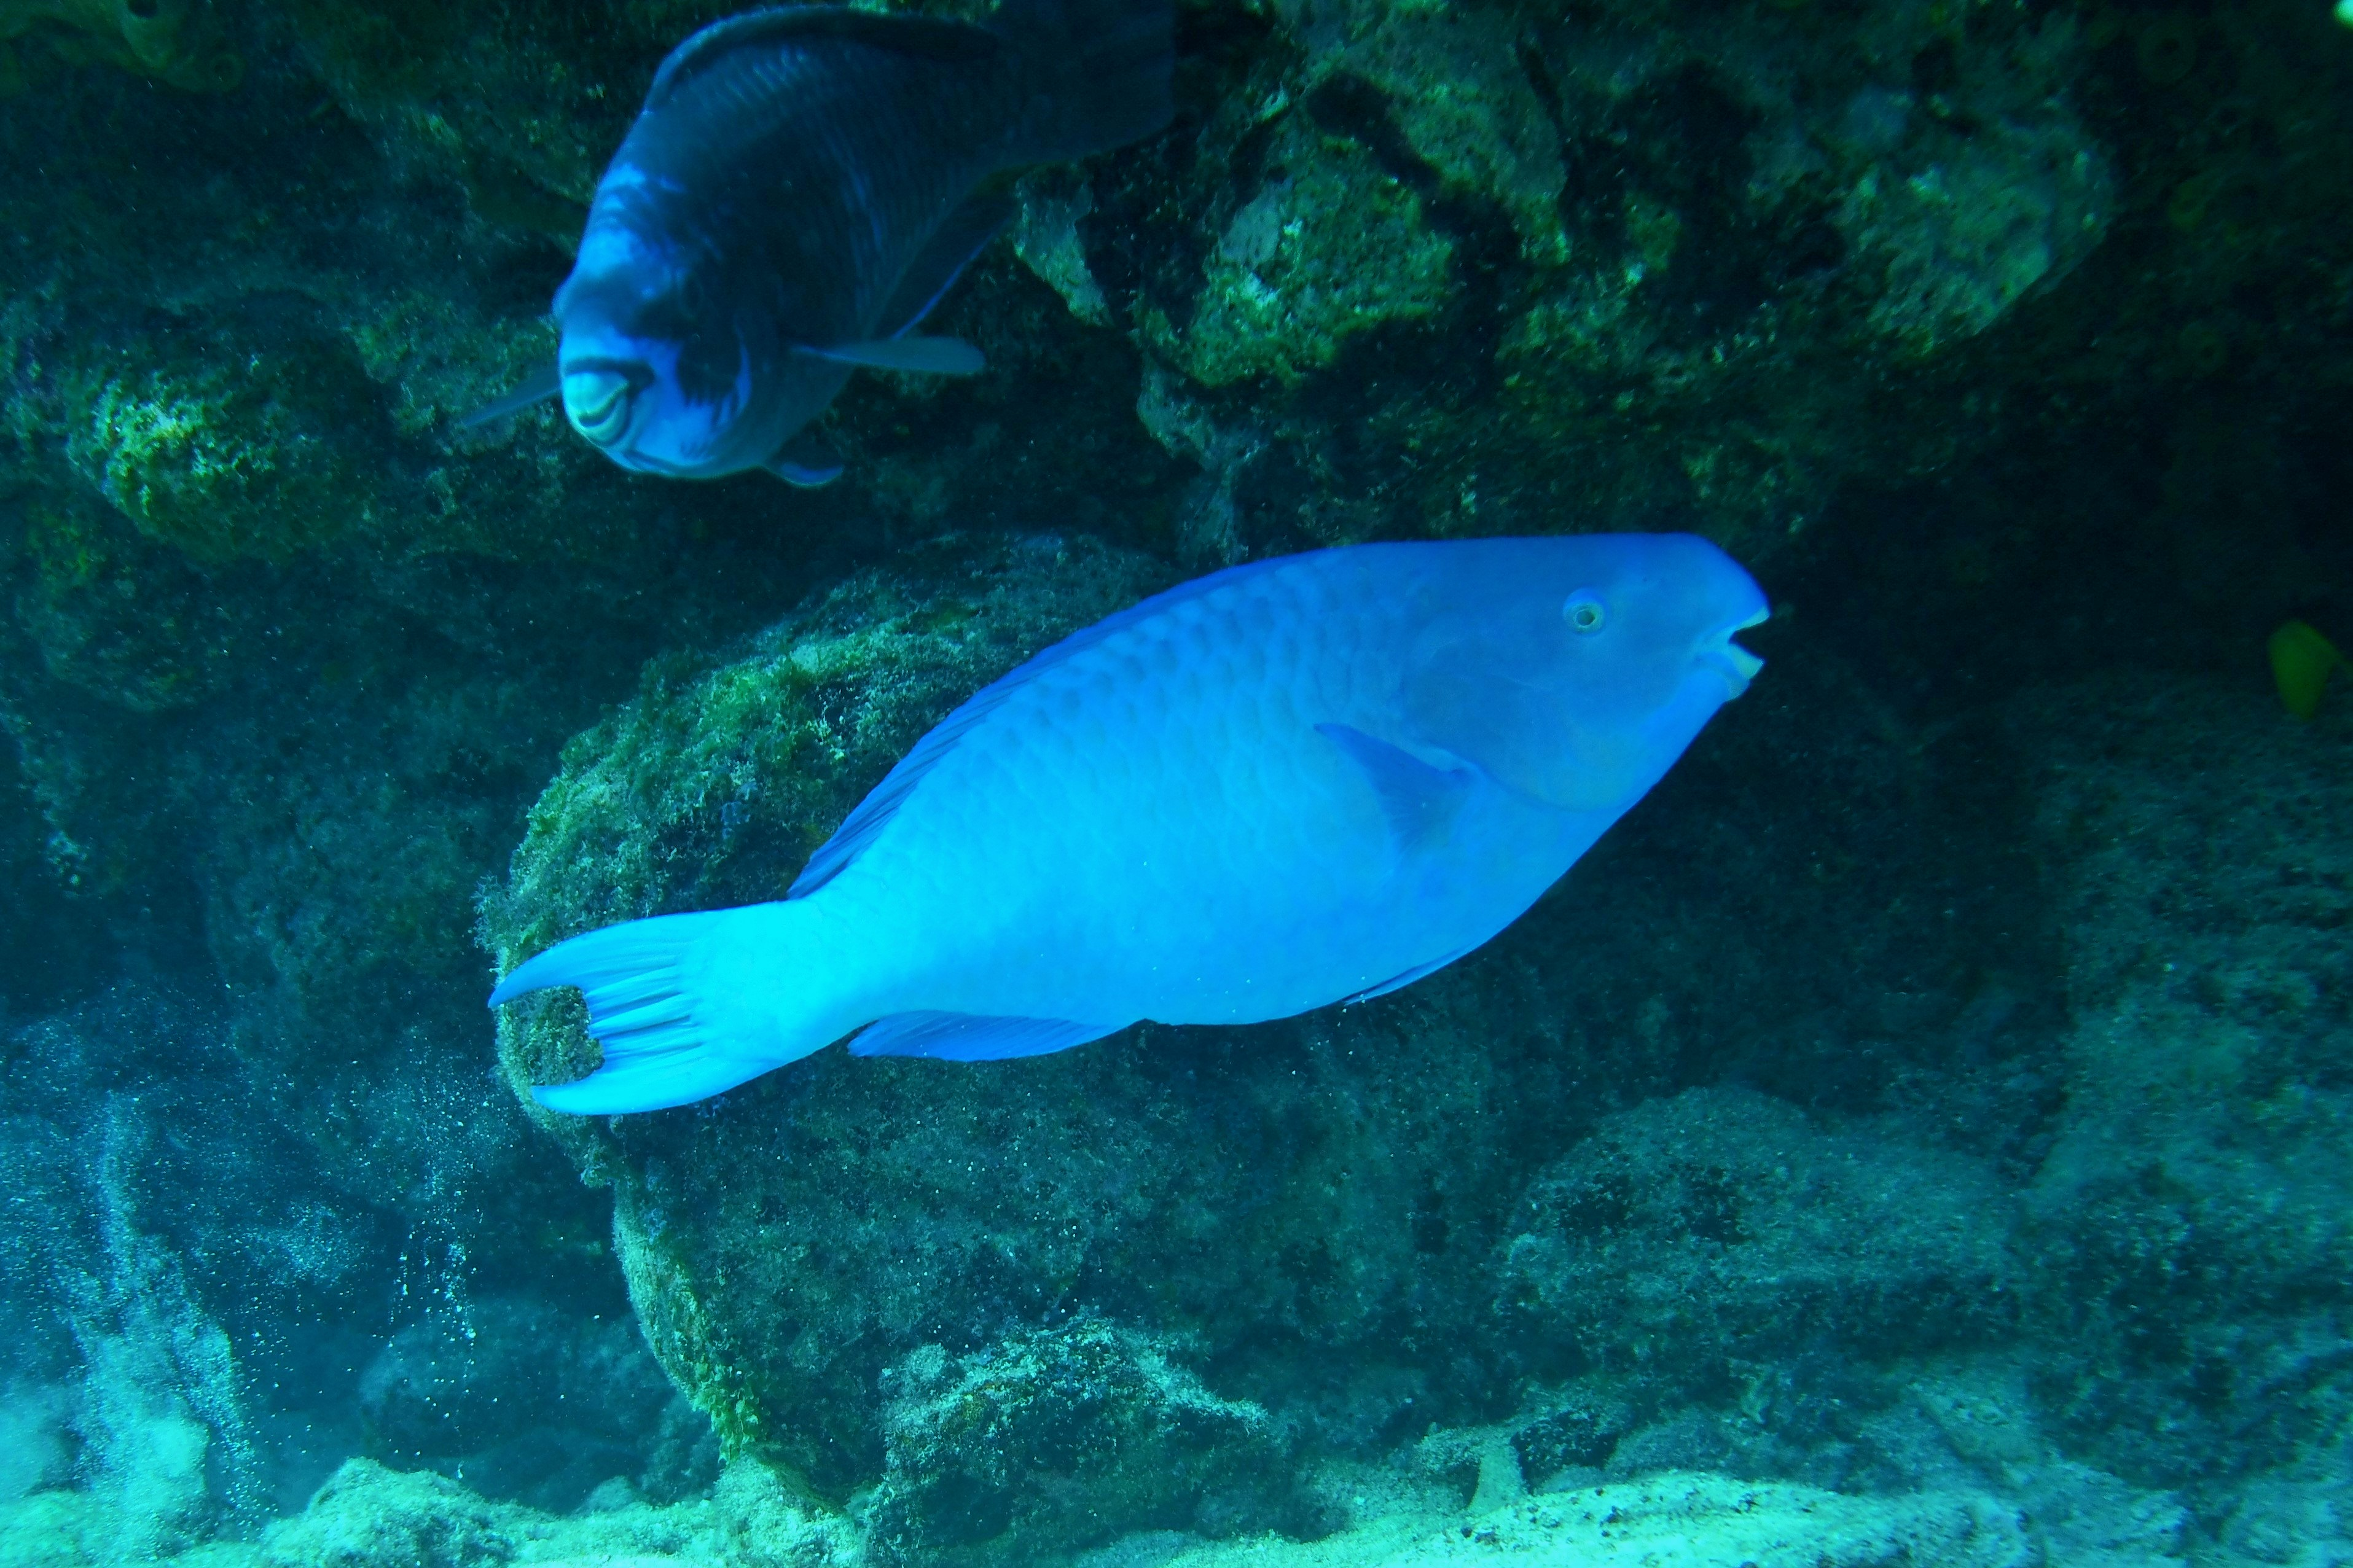 Parotfish